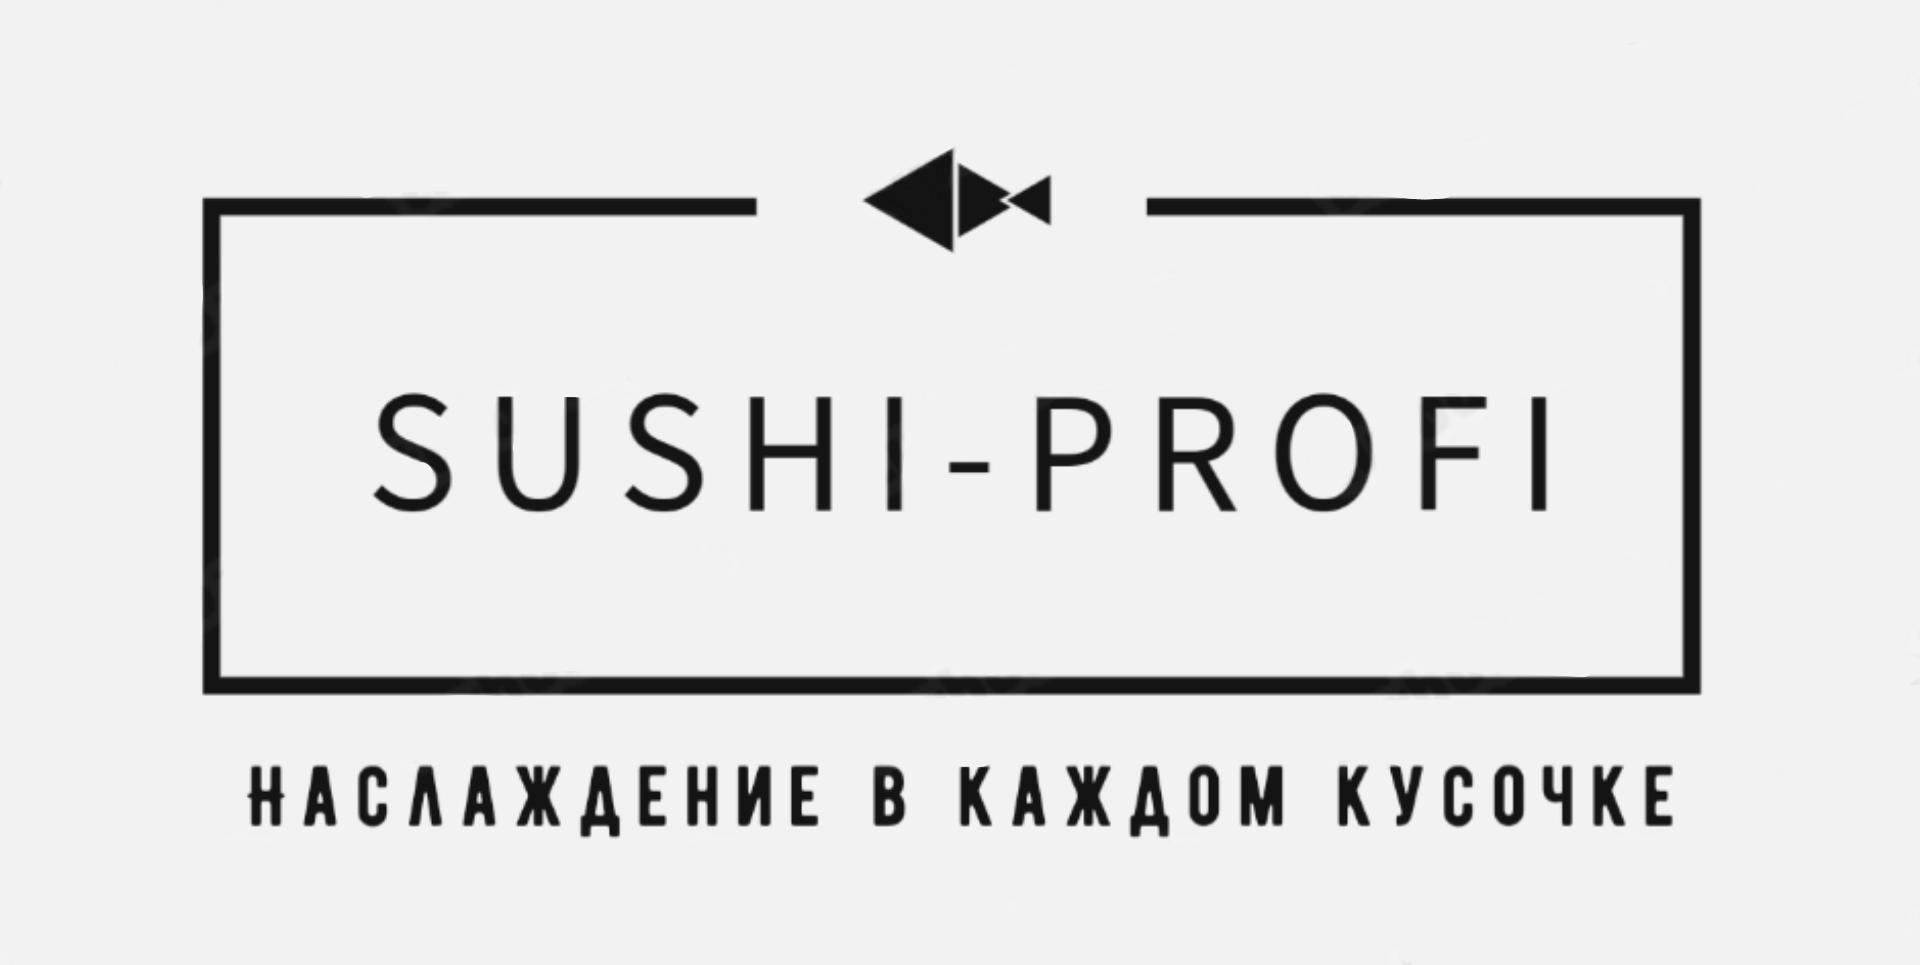 SUSHI-PROFI